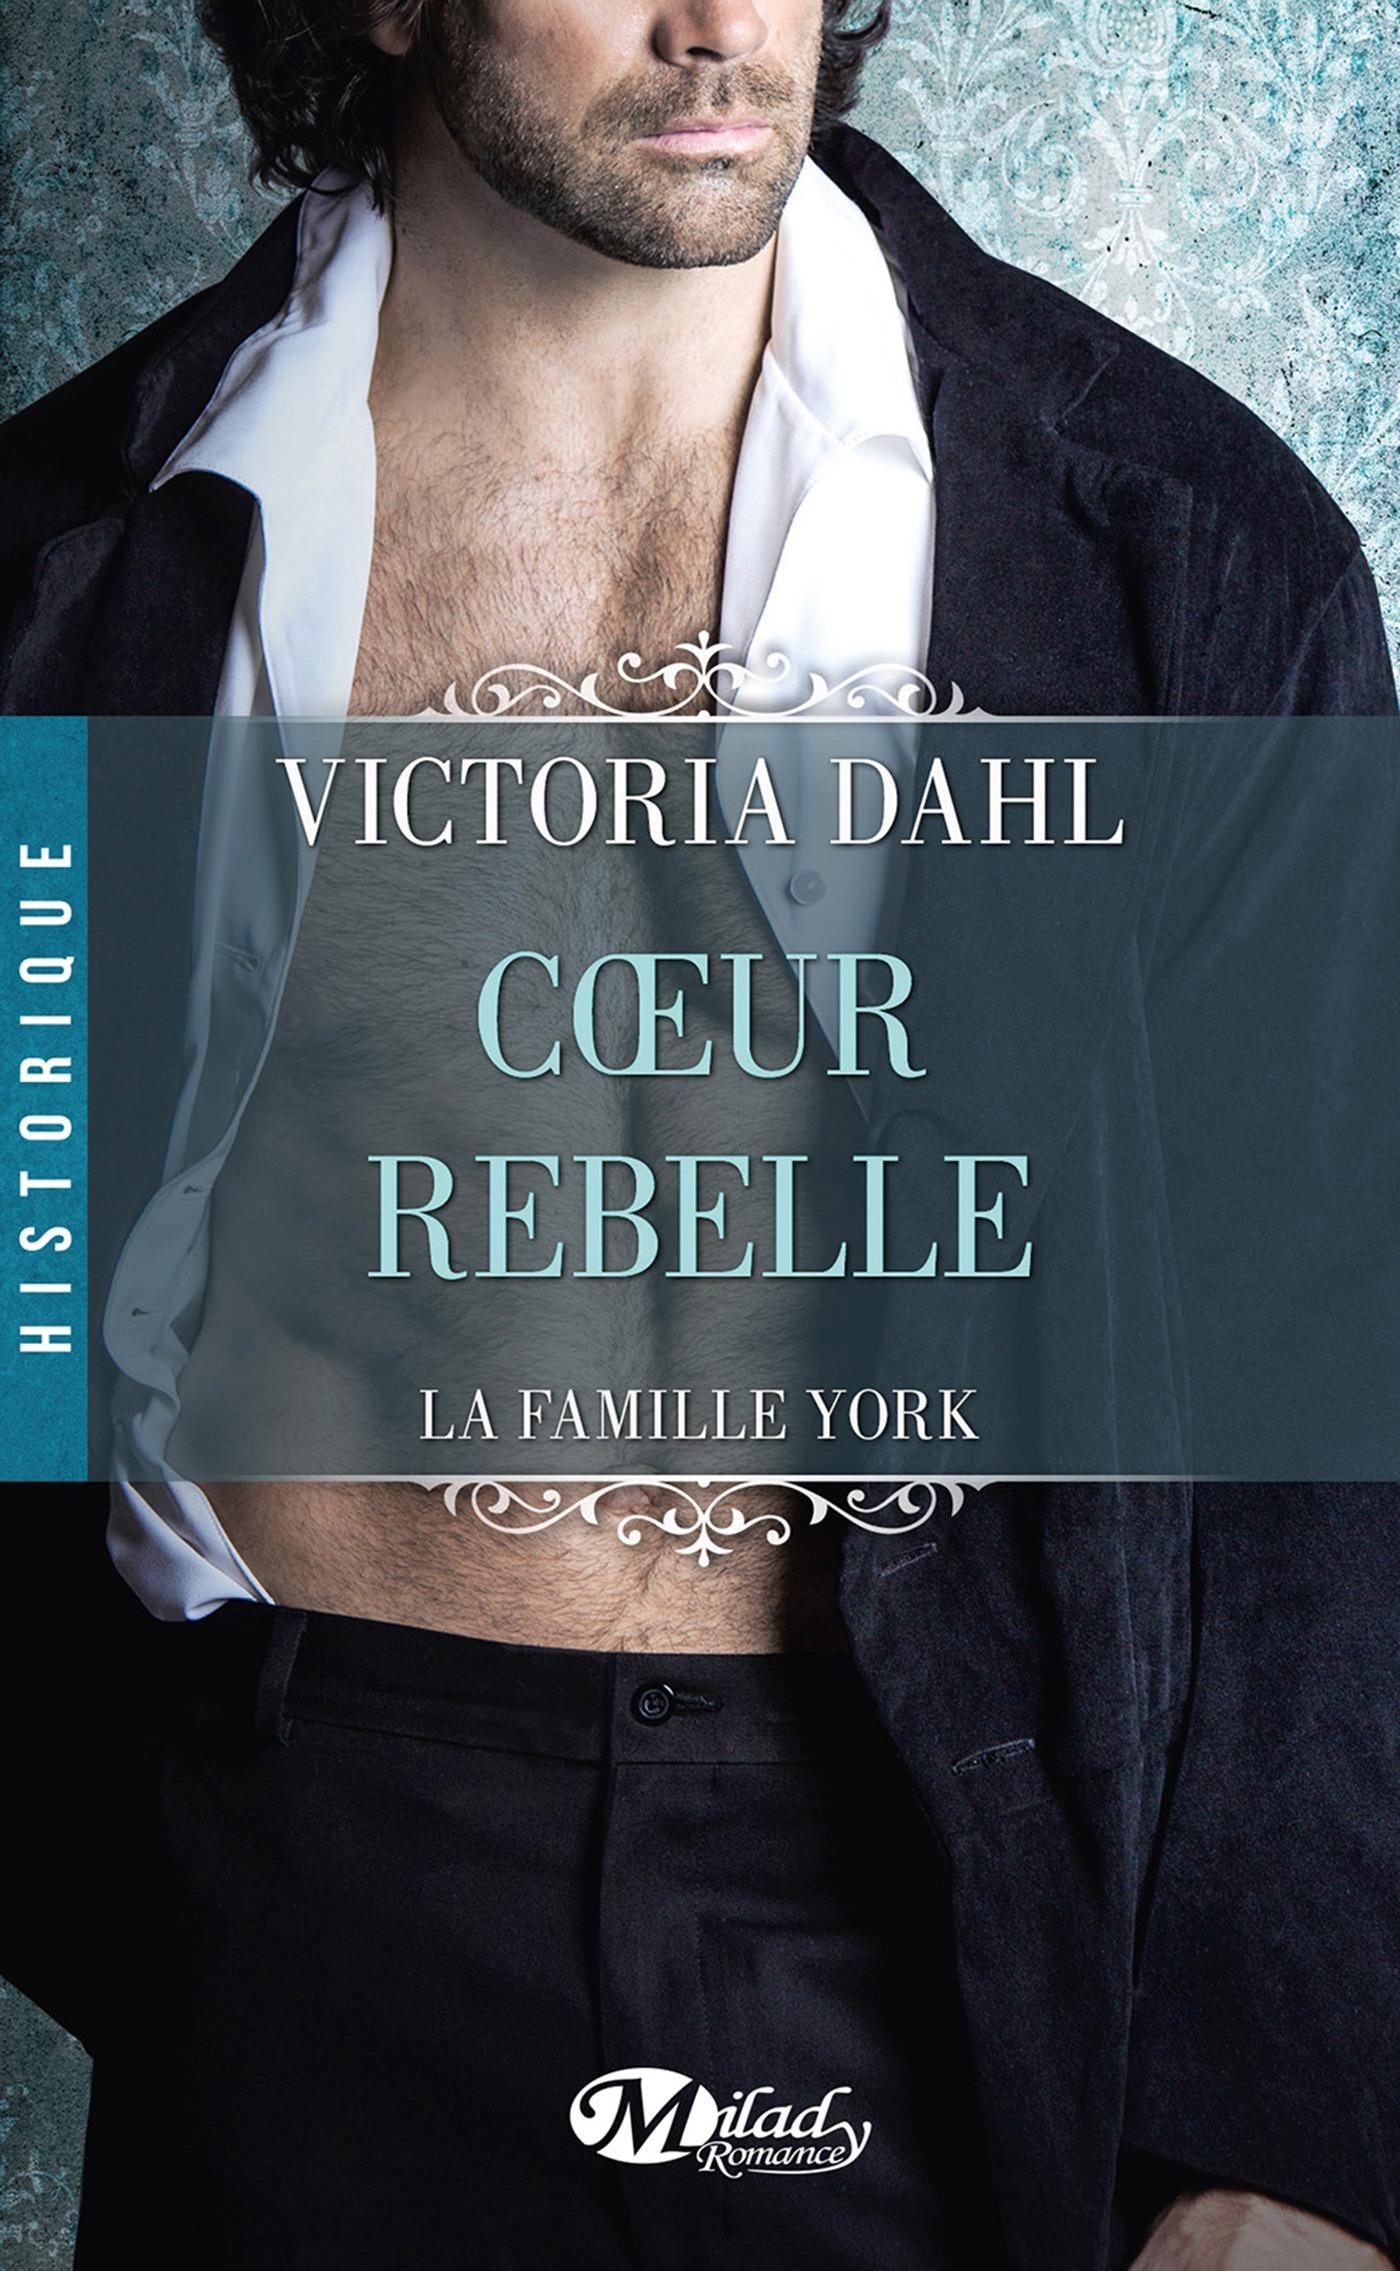 Coeur rebelle, LA FAMILLE YORK, T1